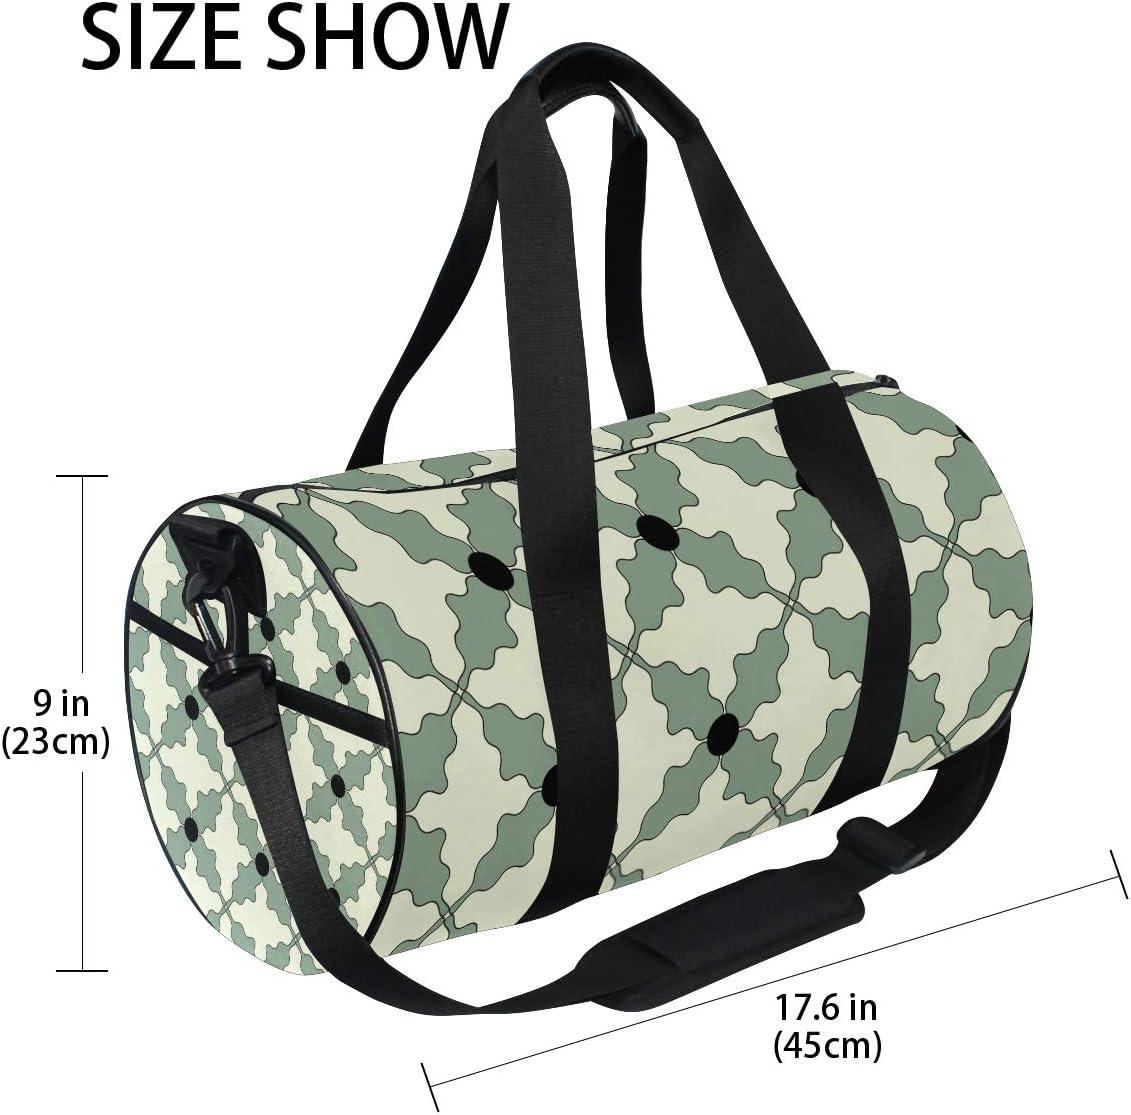 MALPLENA Special Shape Flowers Drum gym duffel bag women Travel Bag